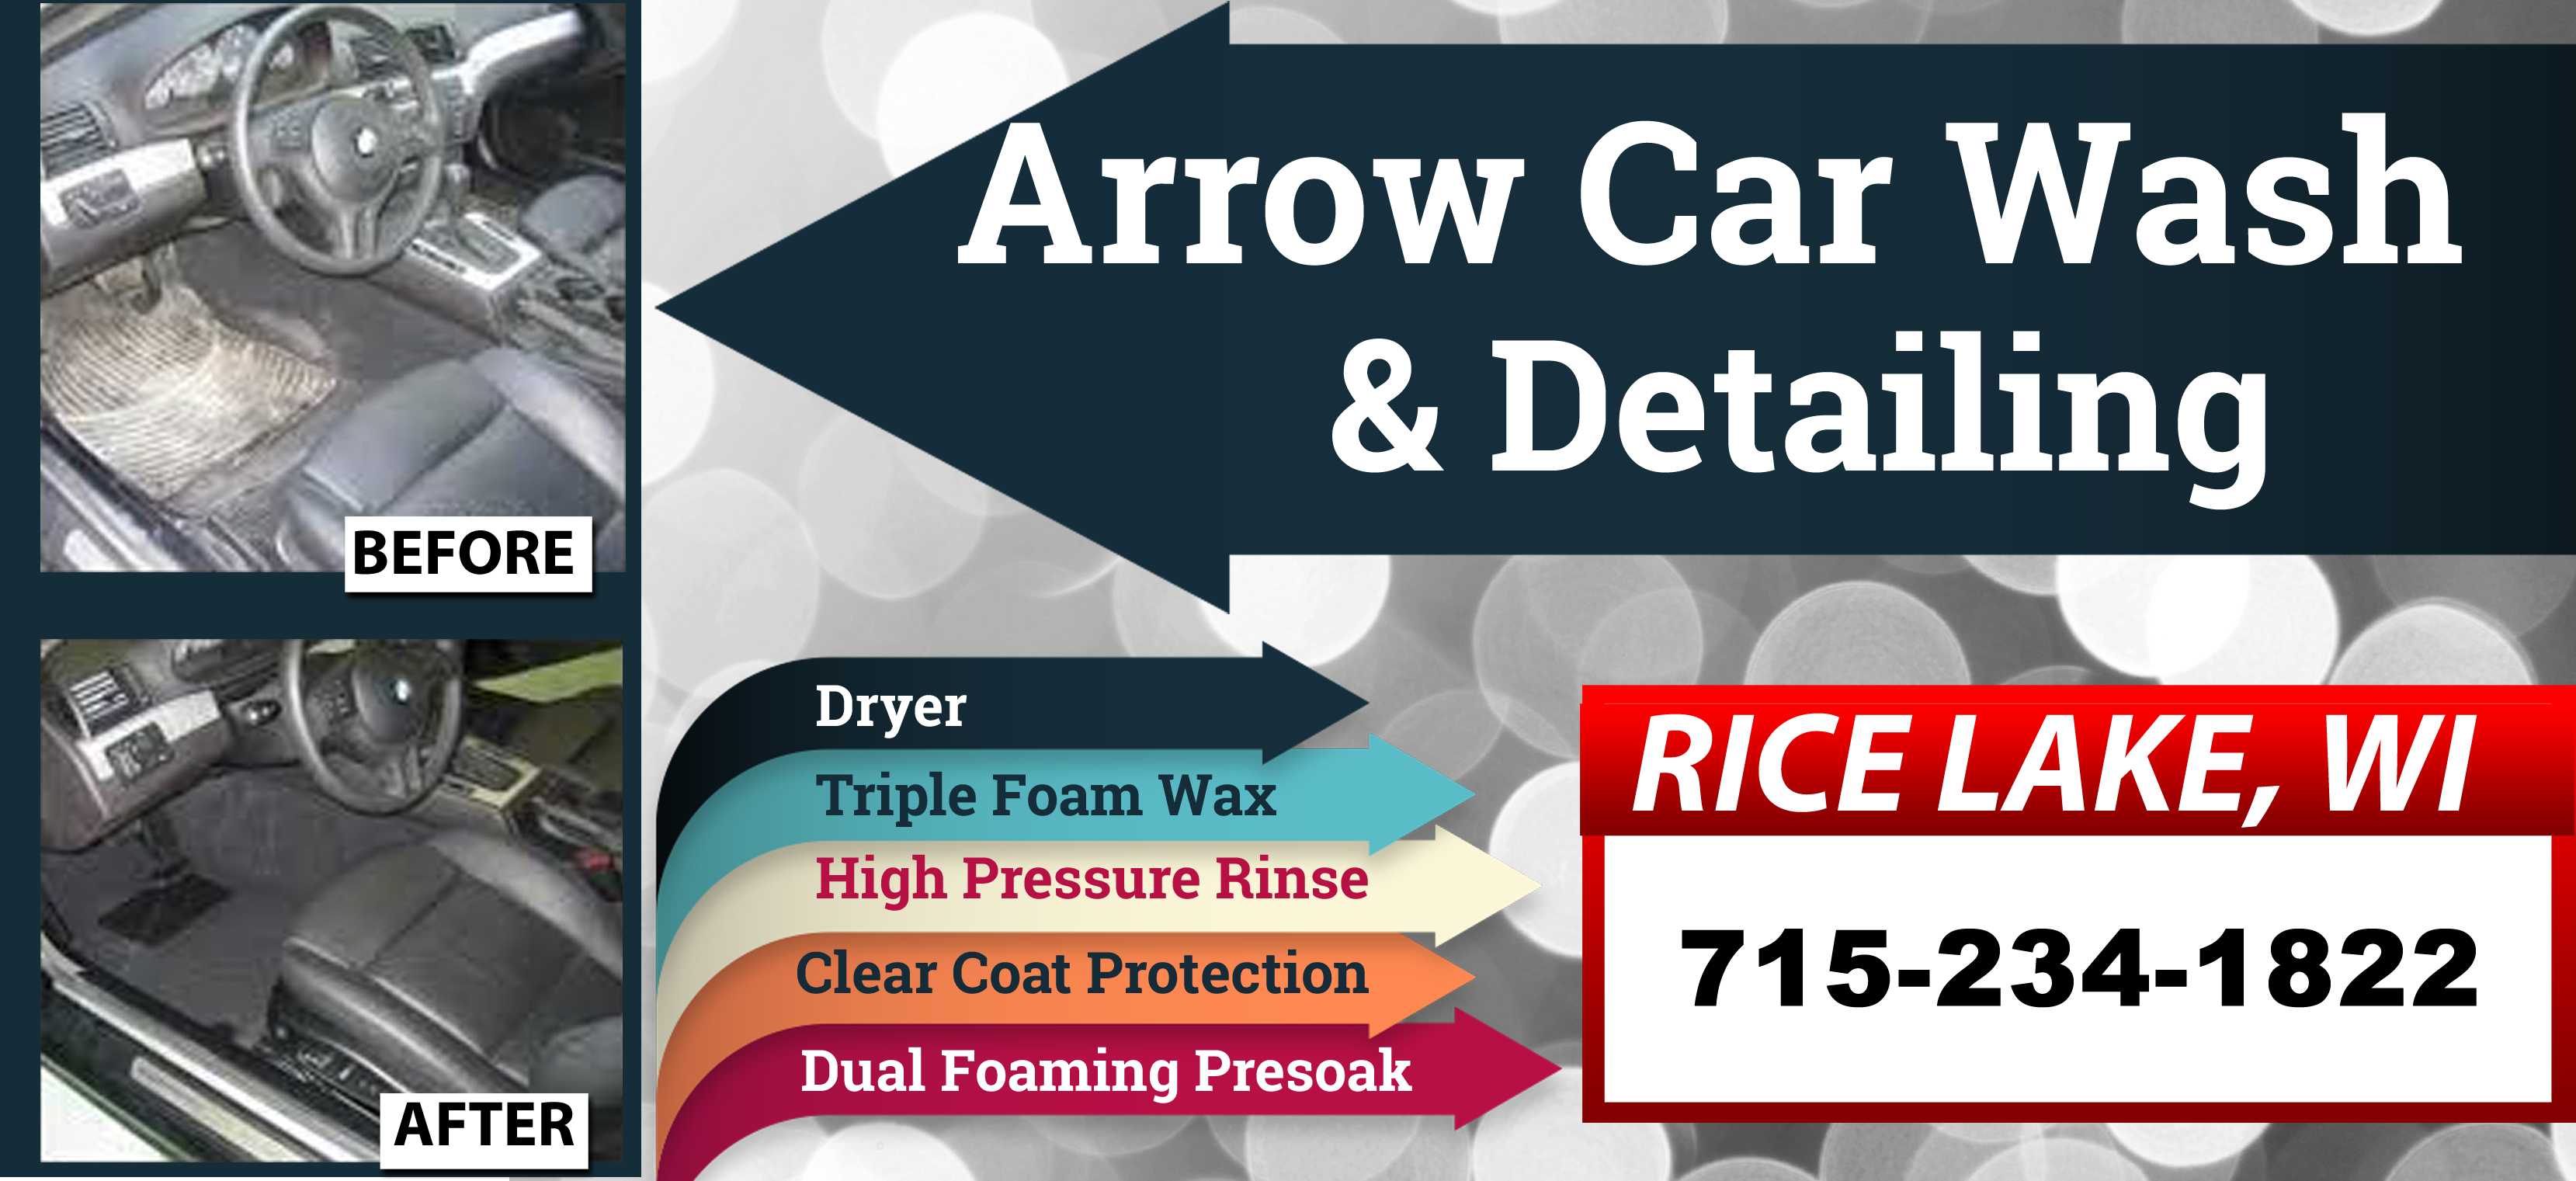 Arrow Car Wash